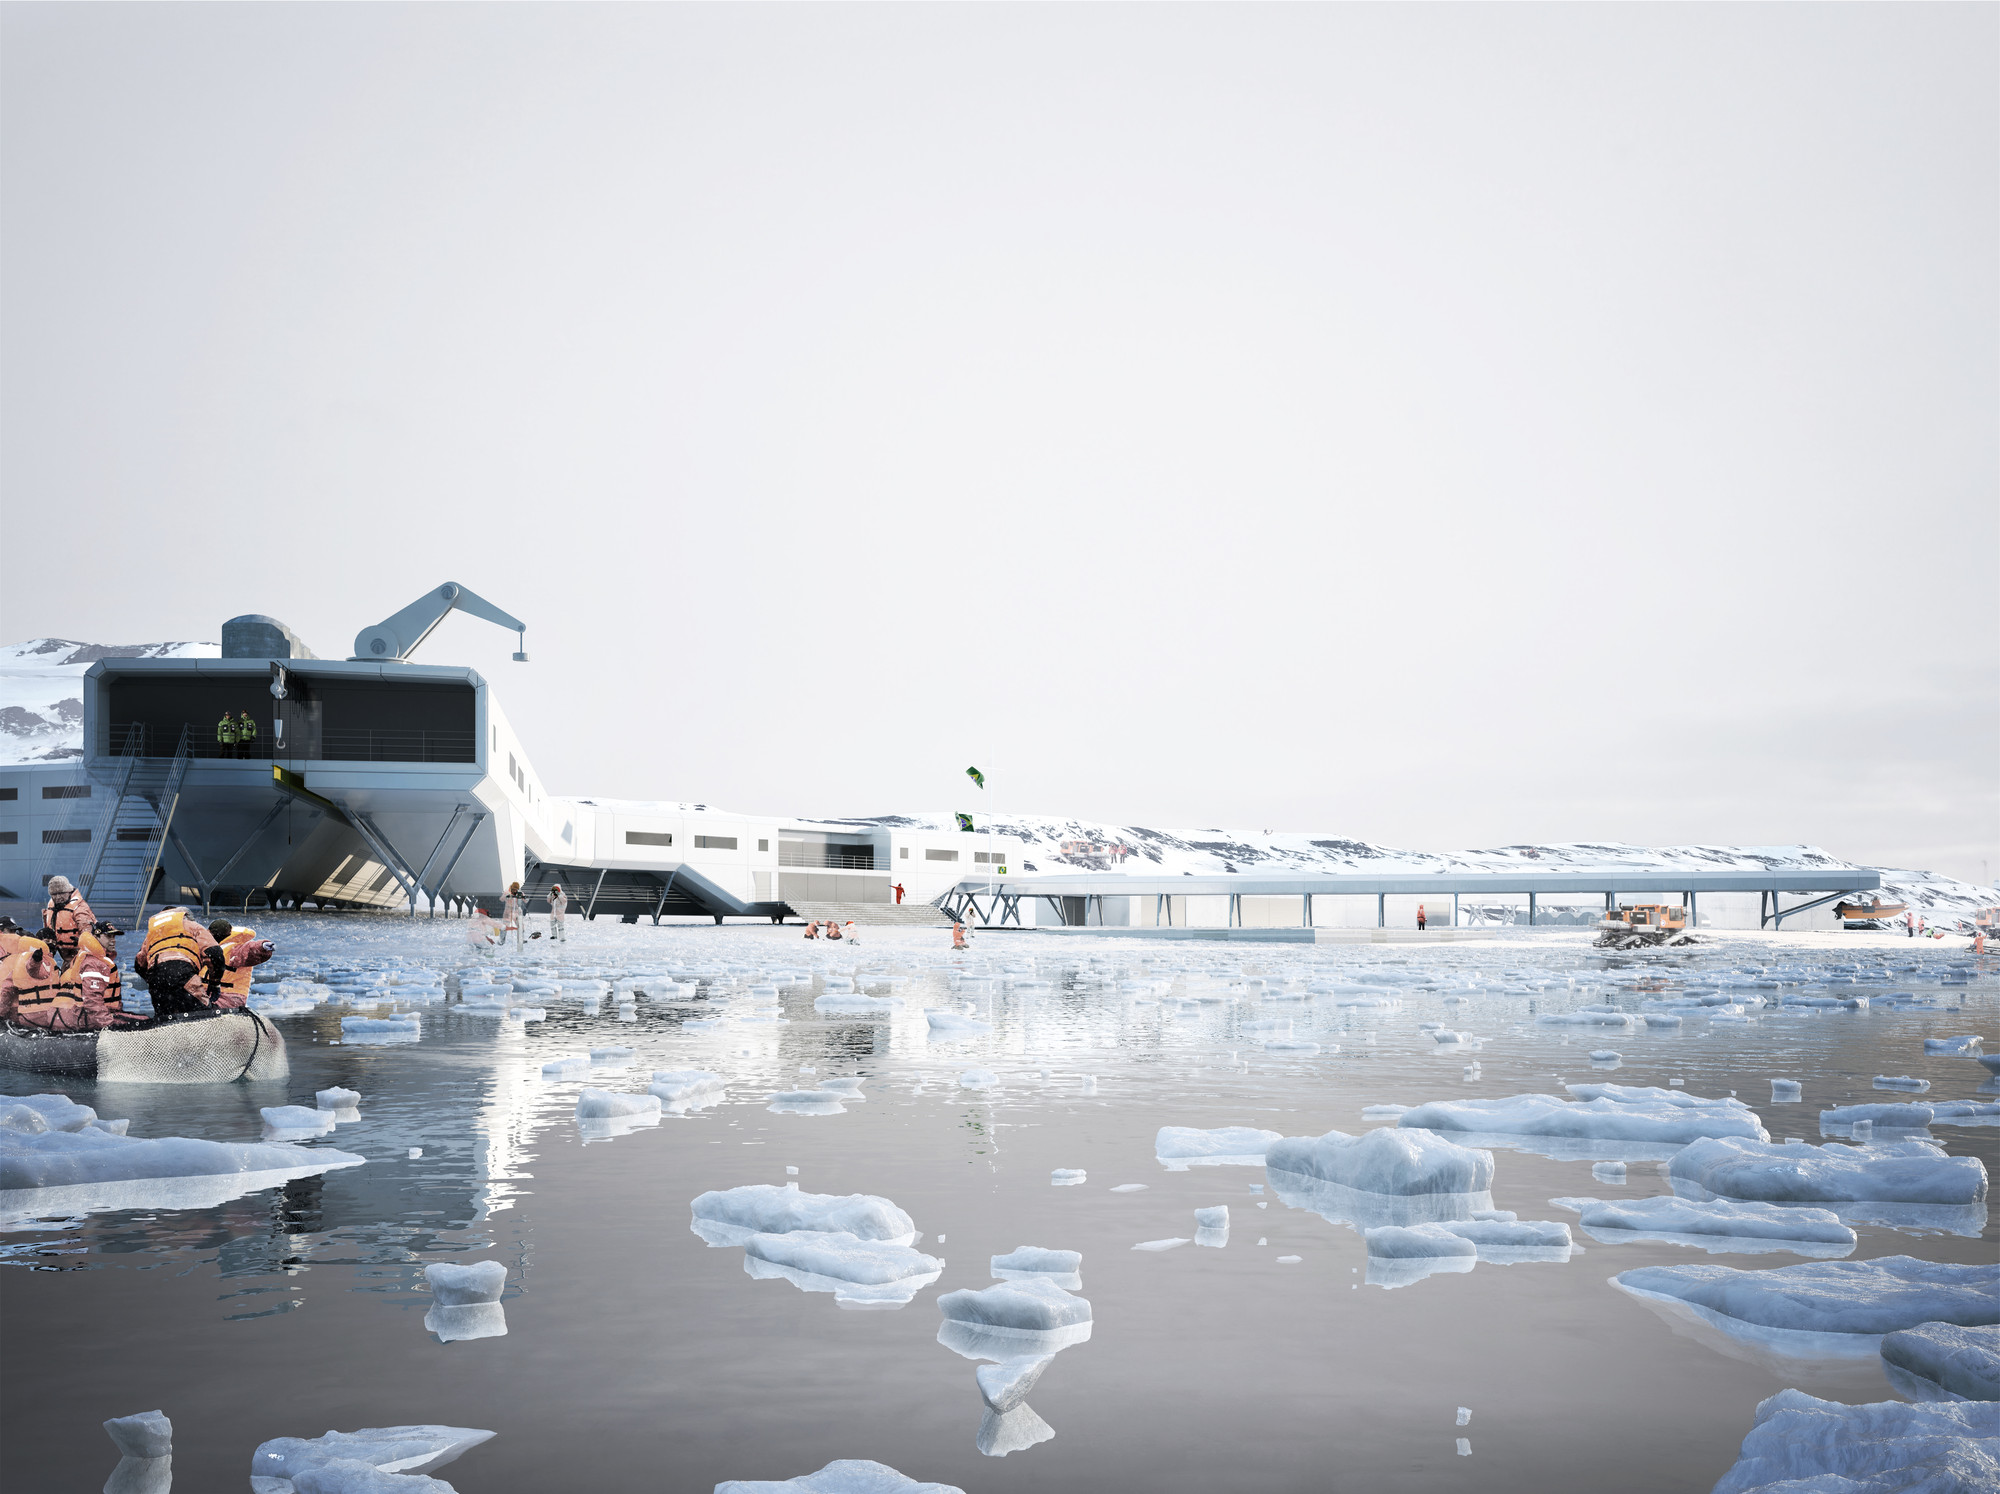 Estação Antártica Comandante Ferraz International Competition 2nd Place / Triptyque, Rendering by rsi-studio.com